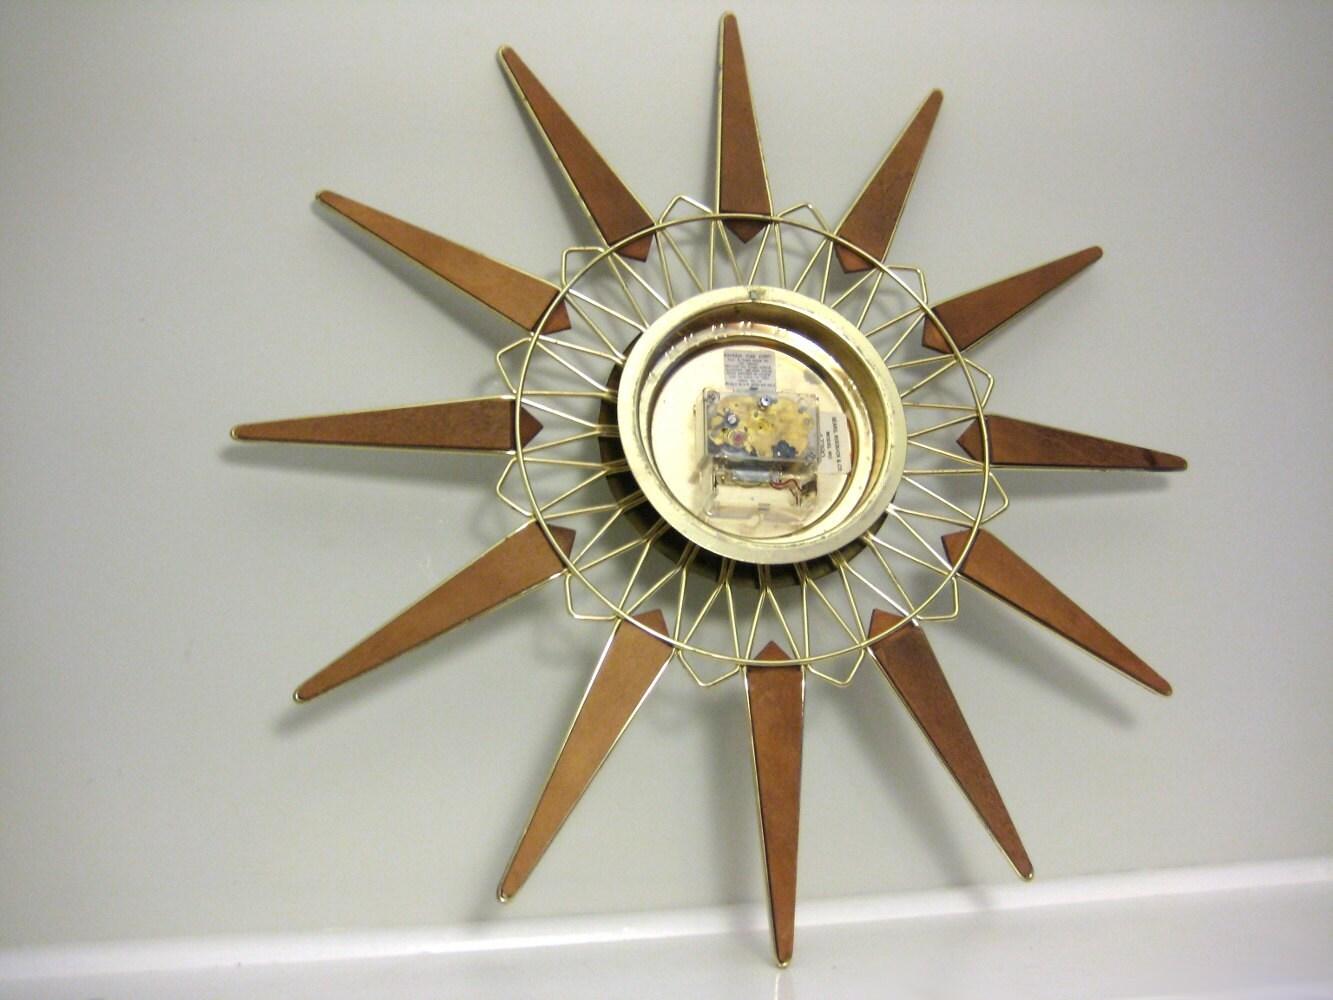 Vintage Wall Clock Retro 1960s Sunburst Clock In Teak Wood